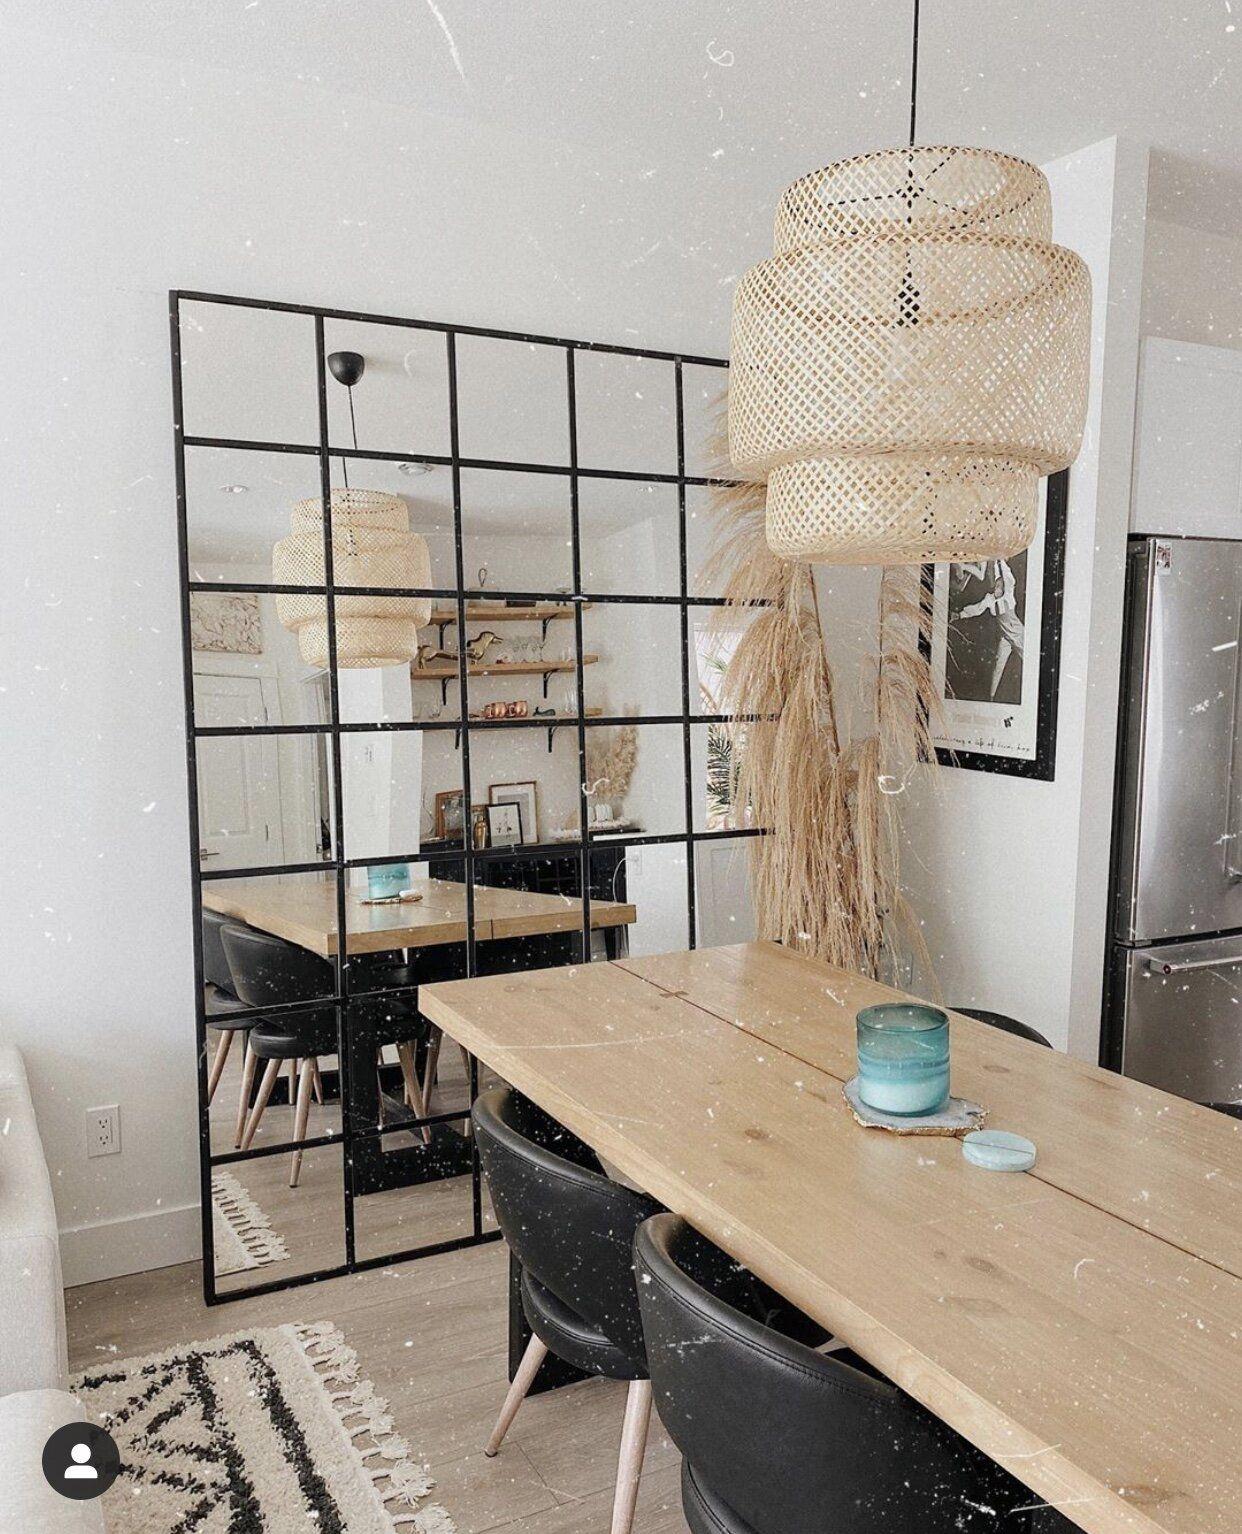 Industrial IKEA Hack Mirror DIY (Inspired by TikTok!)